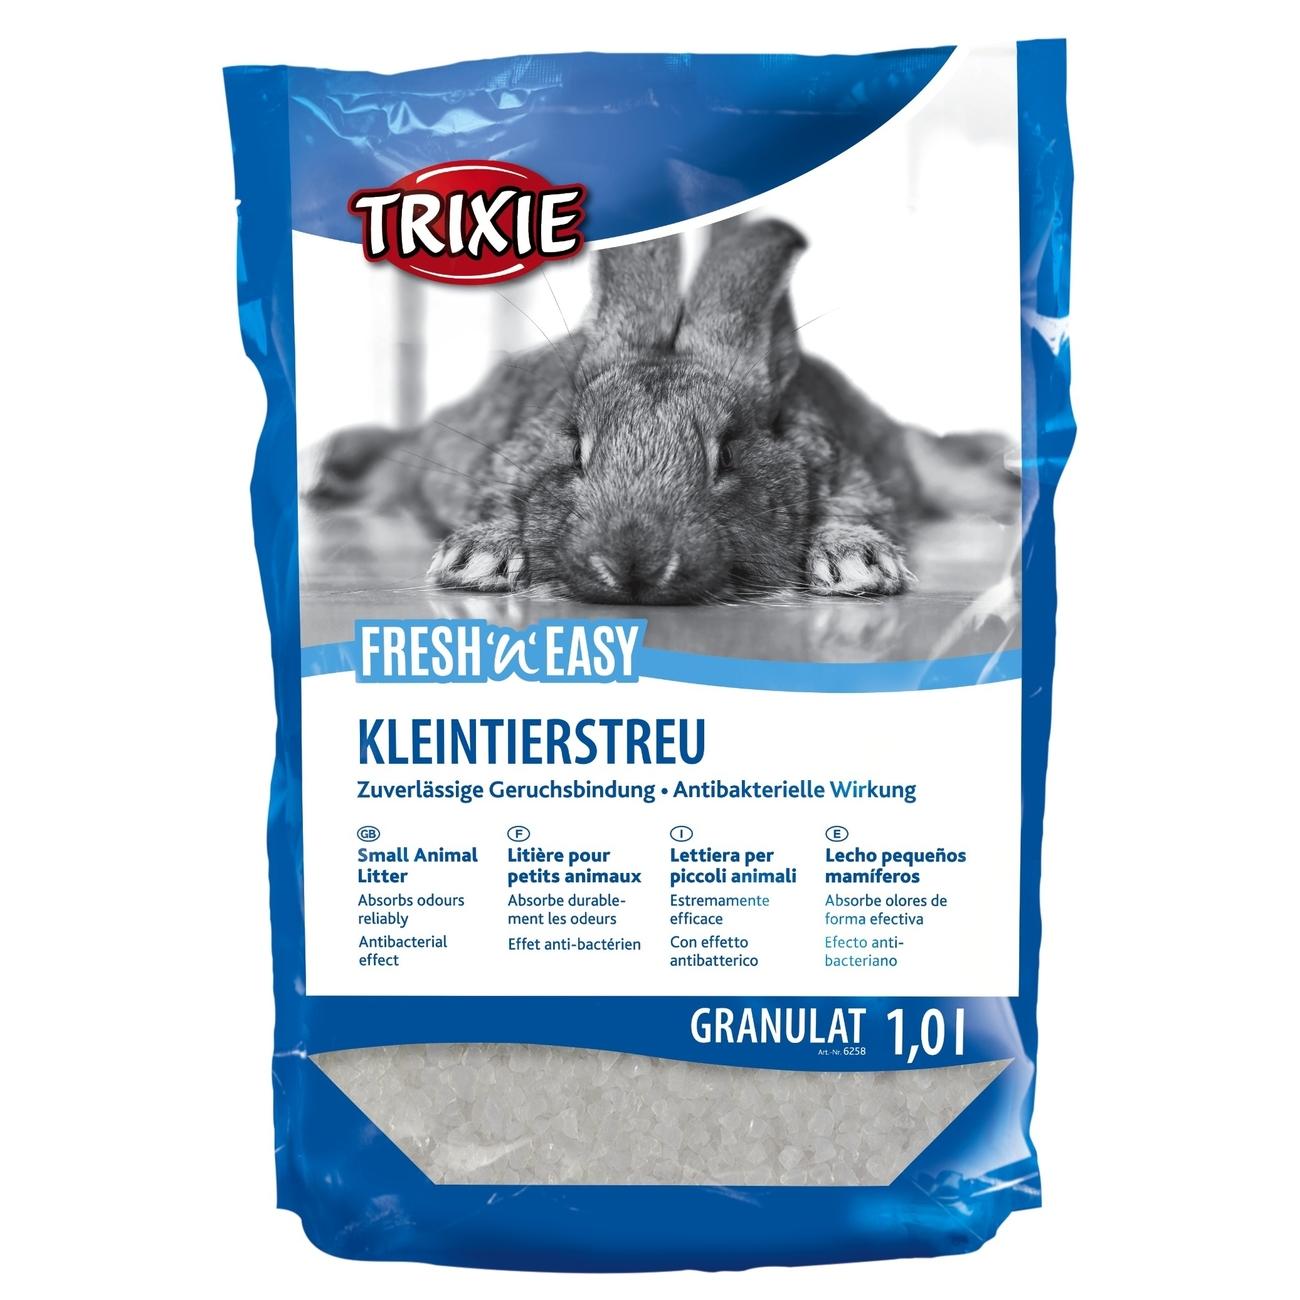 Trixie Fresh n Easy Kleintierstreu Granulat Silikatstreu 6258